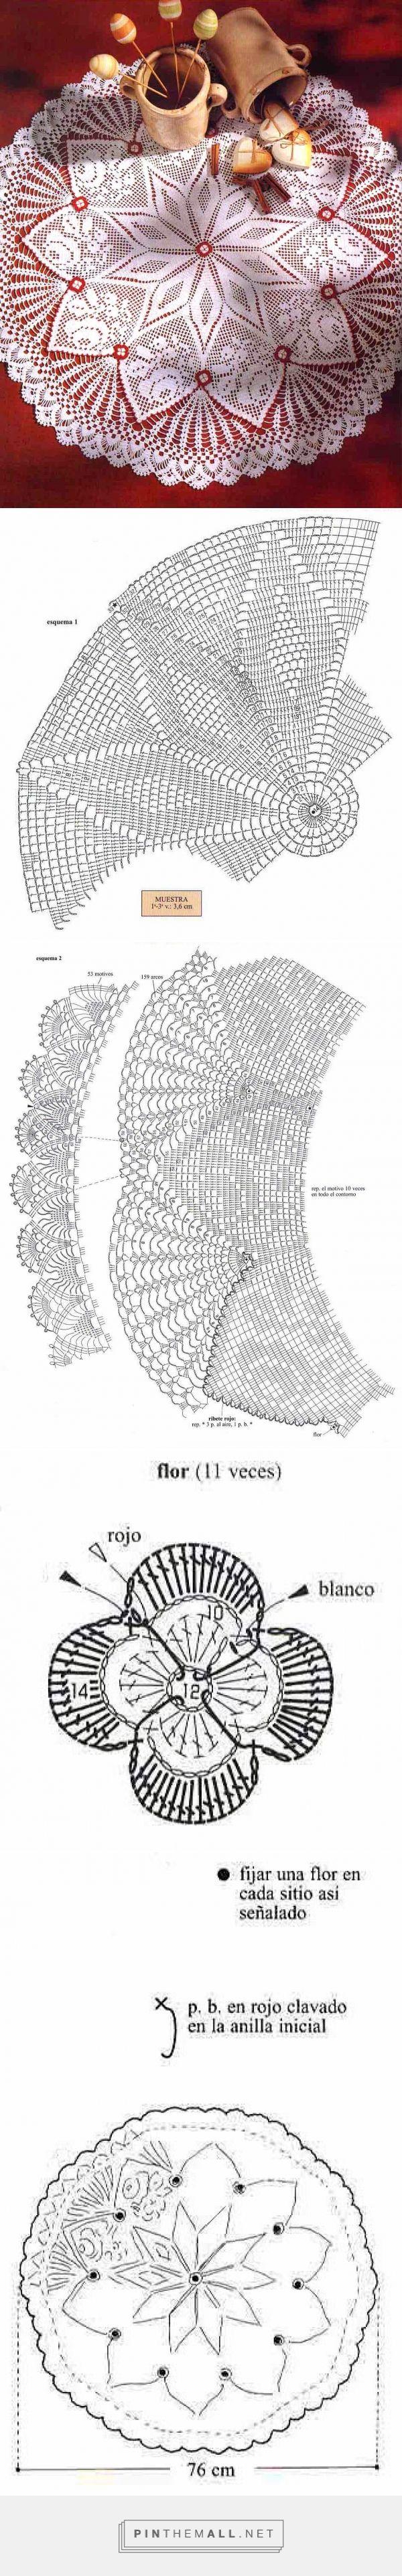 tejidos artesanales en crochet: carpeta inspirada en la naturaleza - created via http://pinthemall.net